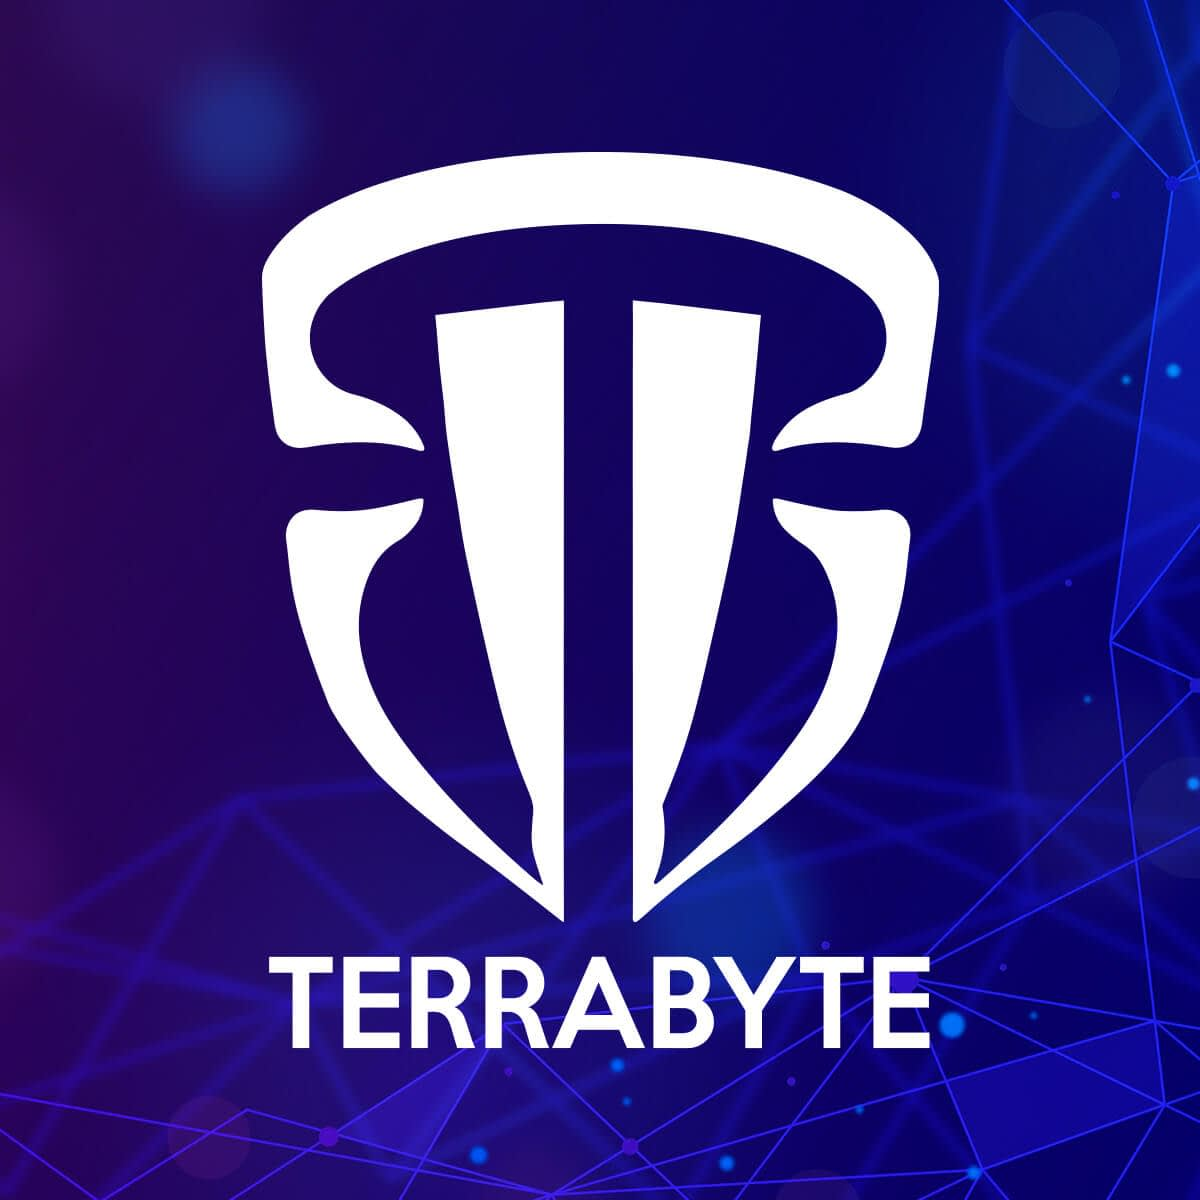 Terrabyte